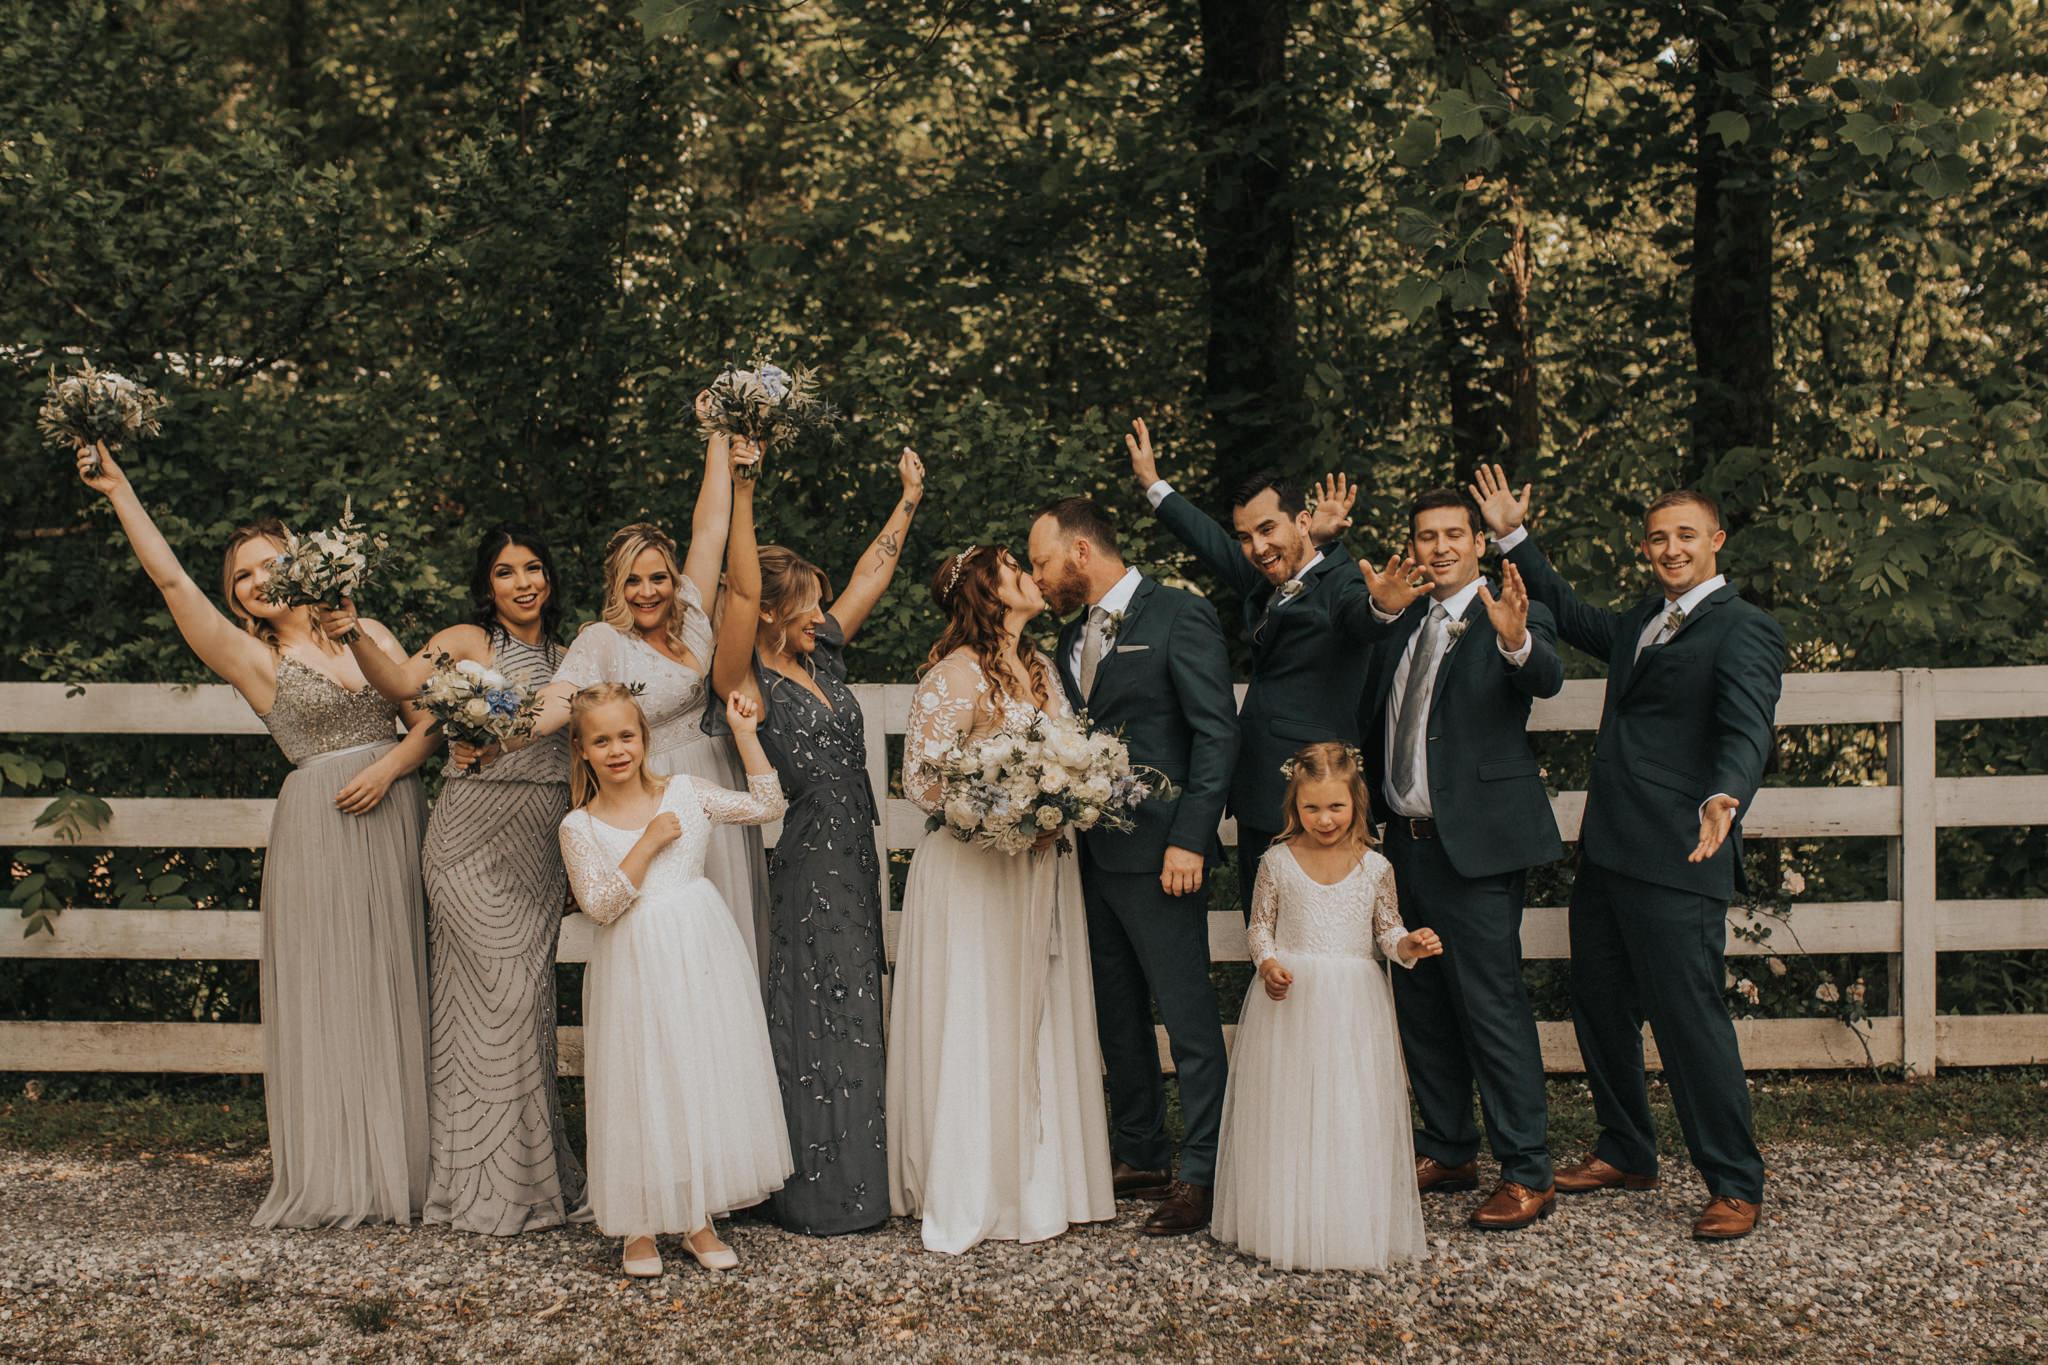 KateMatt-North-Georgia-Wedding-Photographer-Mountain-Laurel-Farm-52.jpg